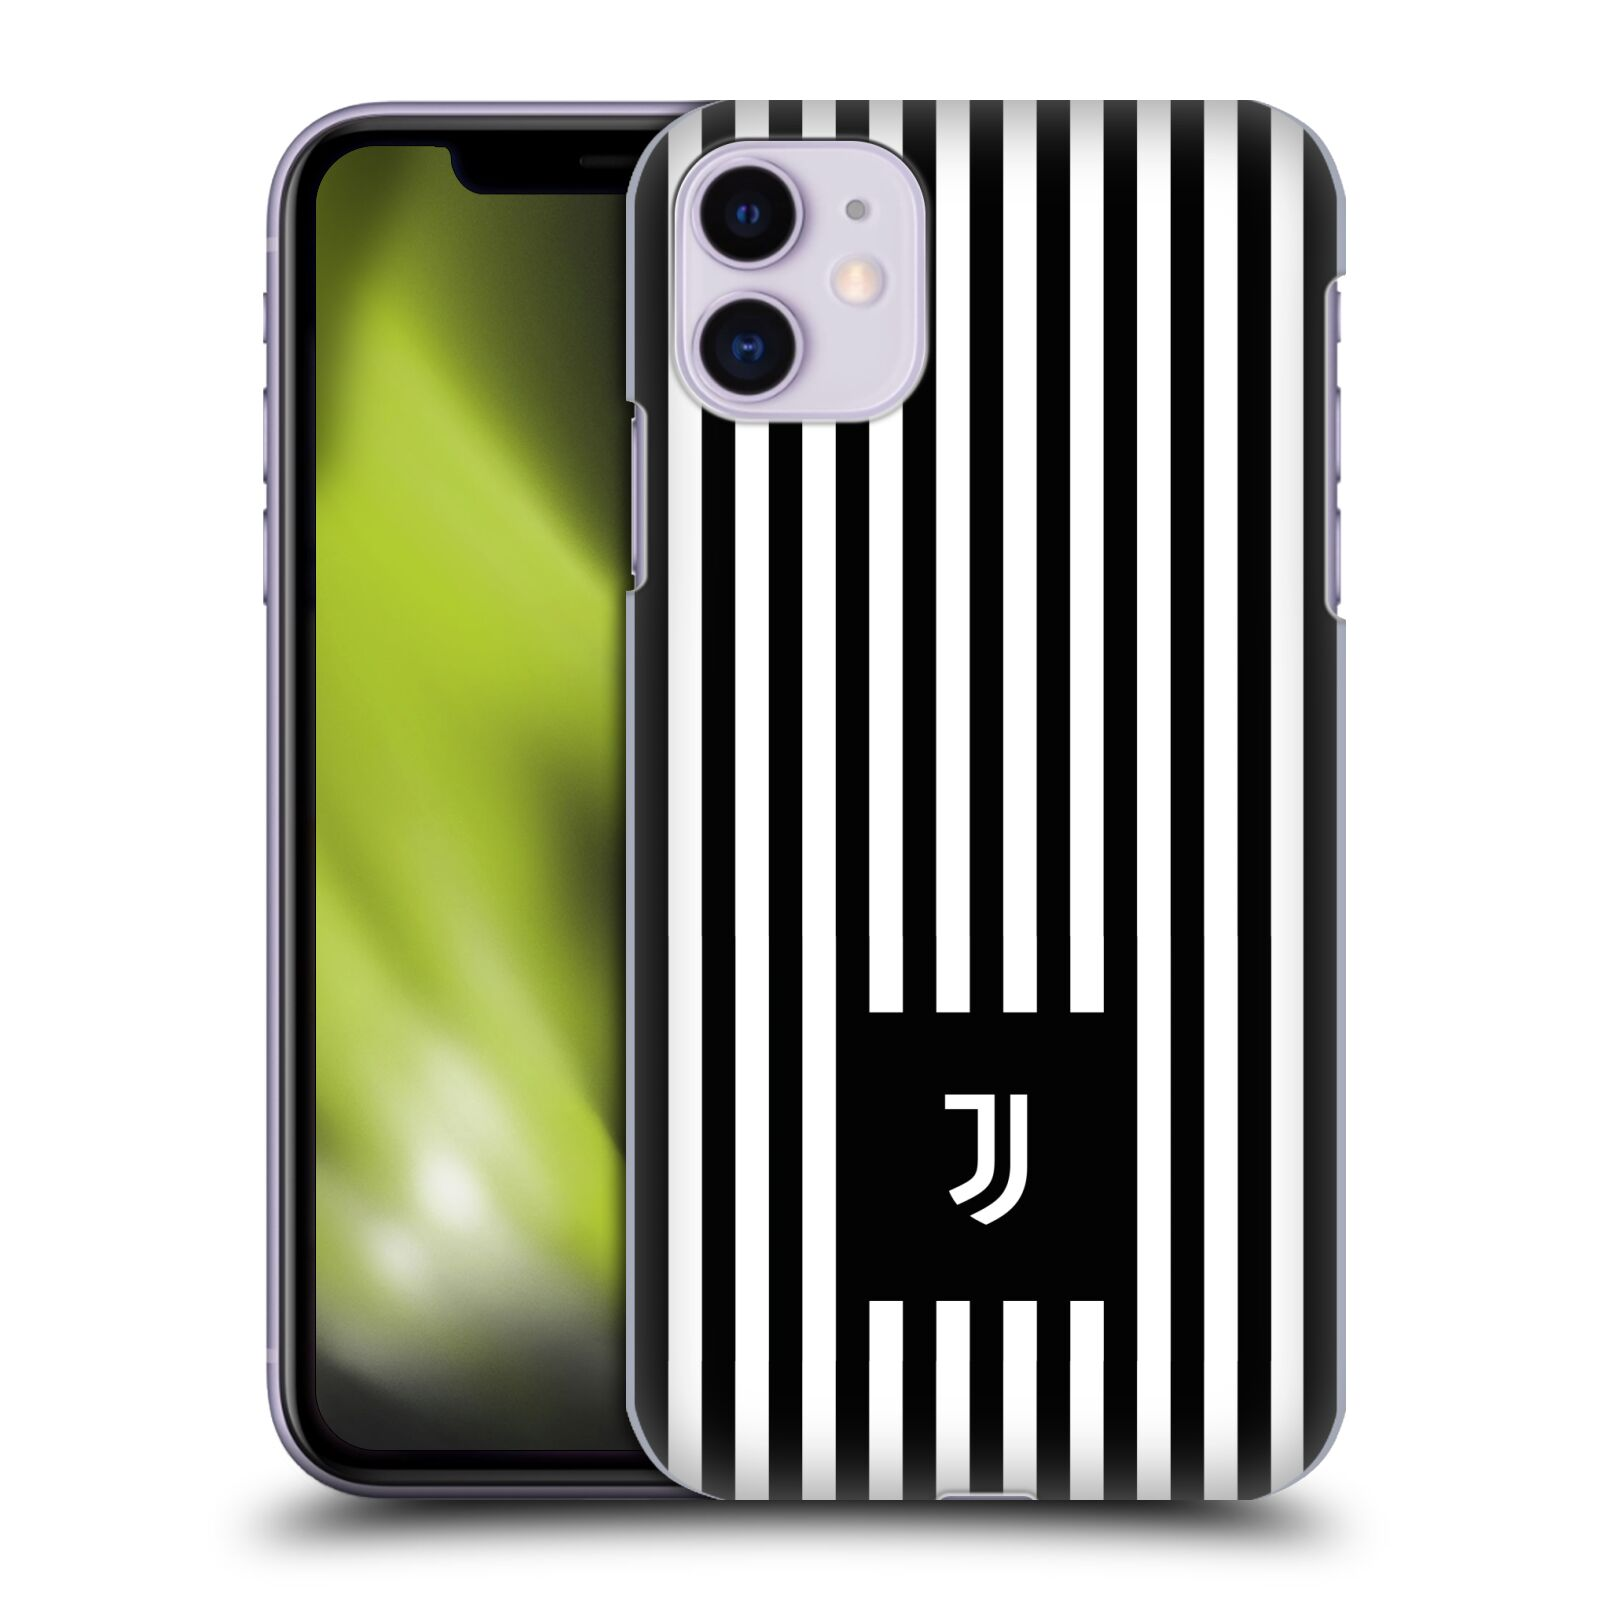 Plastové pouzdro na mobil Apple iPhone 11 - Head Case - Juventus FC - Nové logo - Pruhy